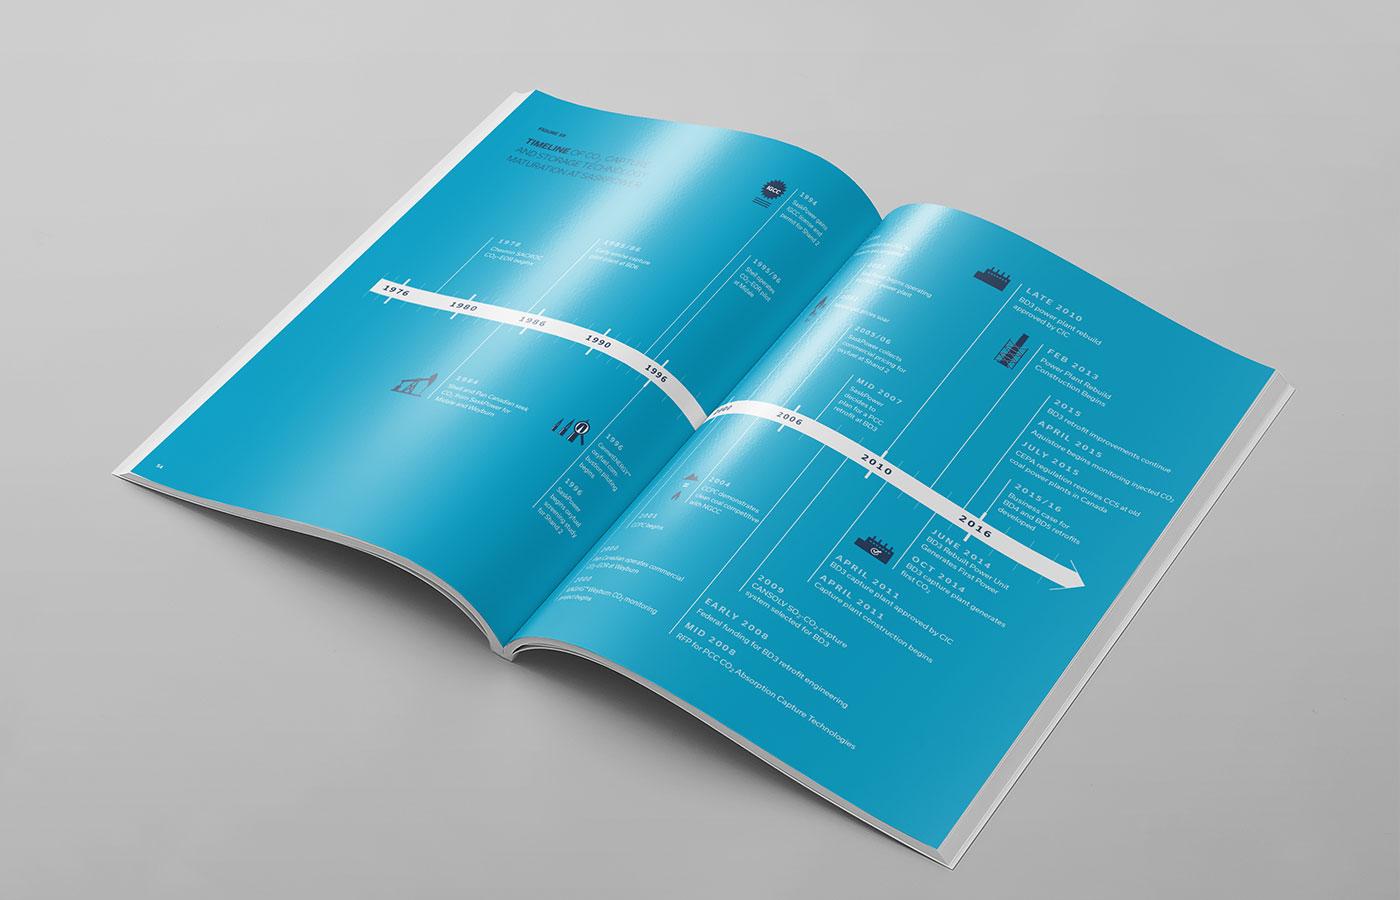 covetdesign_logo-design_branding_brochure-design_graphic-designer_vancouver_print_saskpower10